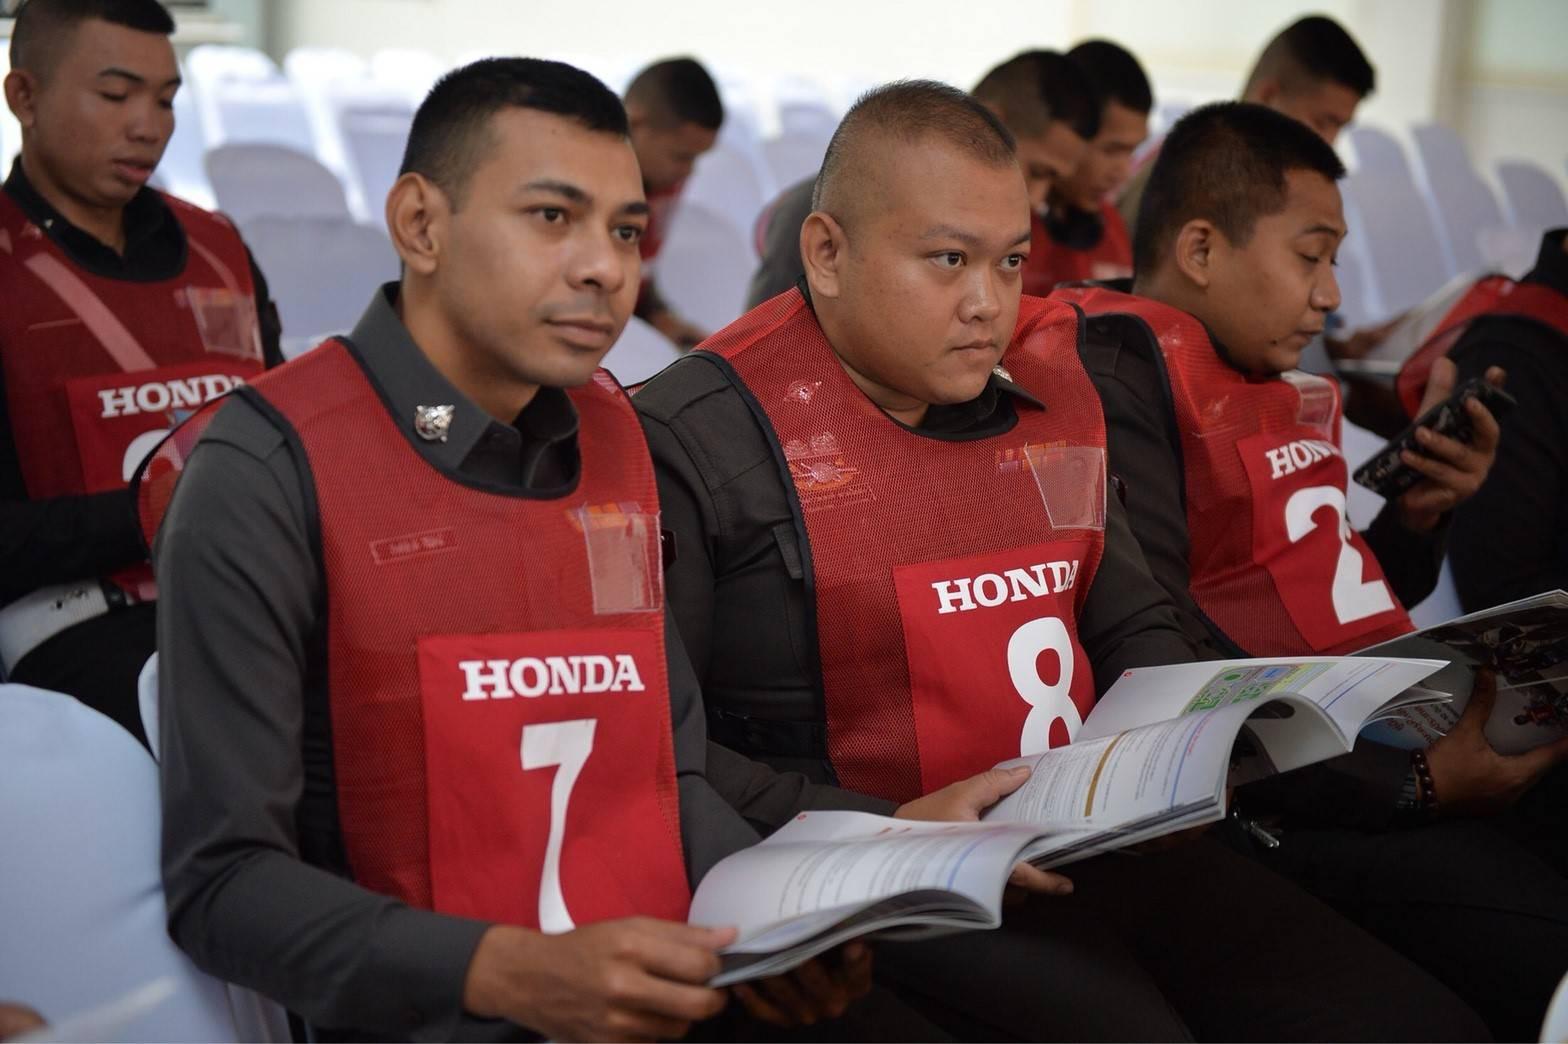 Honda-Motorcycle-มอเตอร์ไซค์-ฮอนด้า-20180315-ข่าวประชาสัมพันธ์-csrsafetypolice